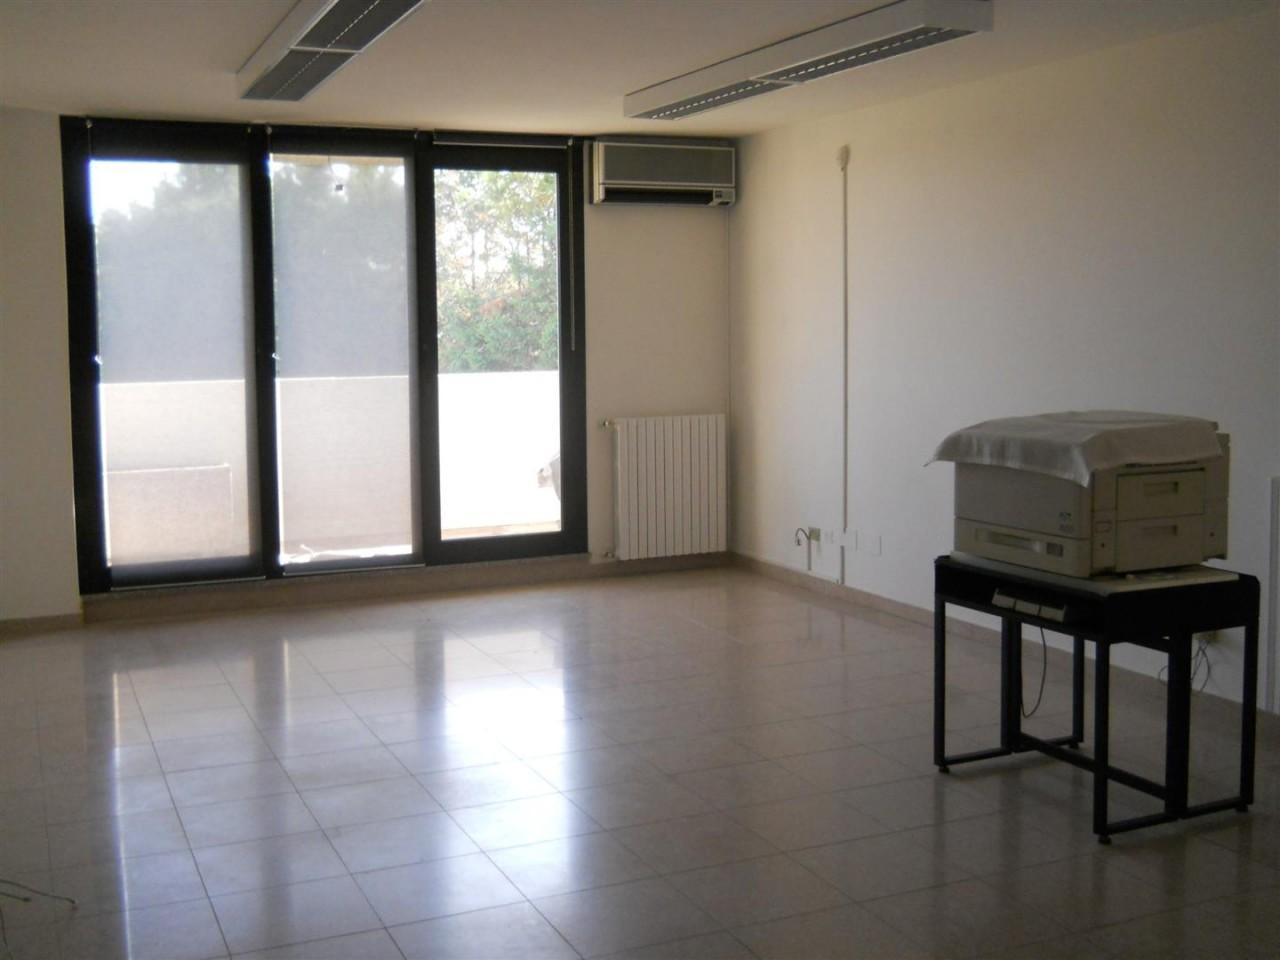 Ufficio fronte strada https://media.gestionaleimmobiliare.it/foto/annunci/151210/1224666/1280x1280/dscn3332_large.jpg